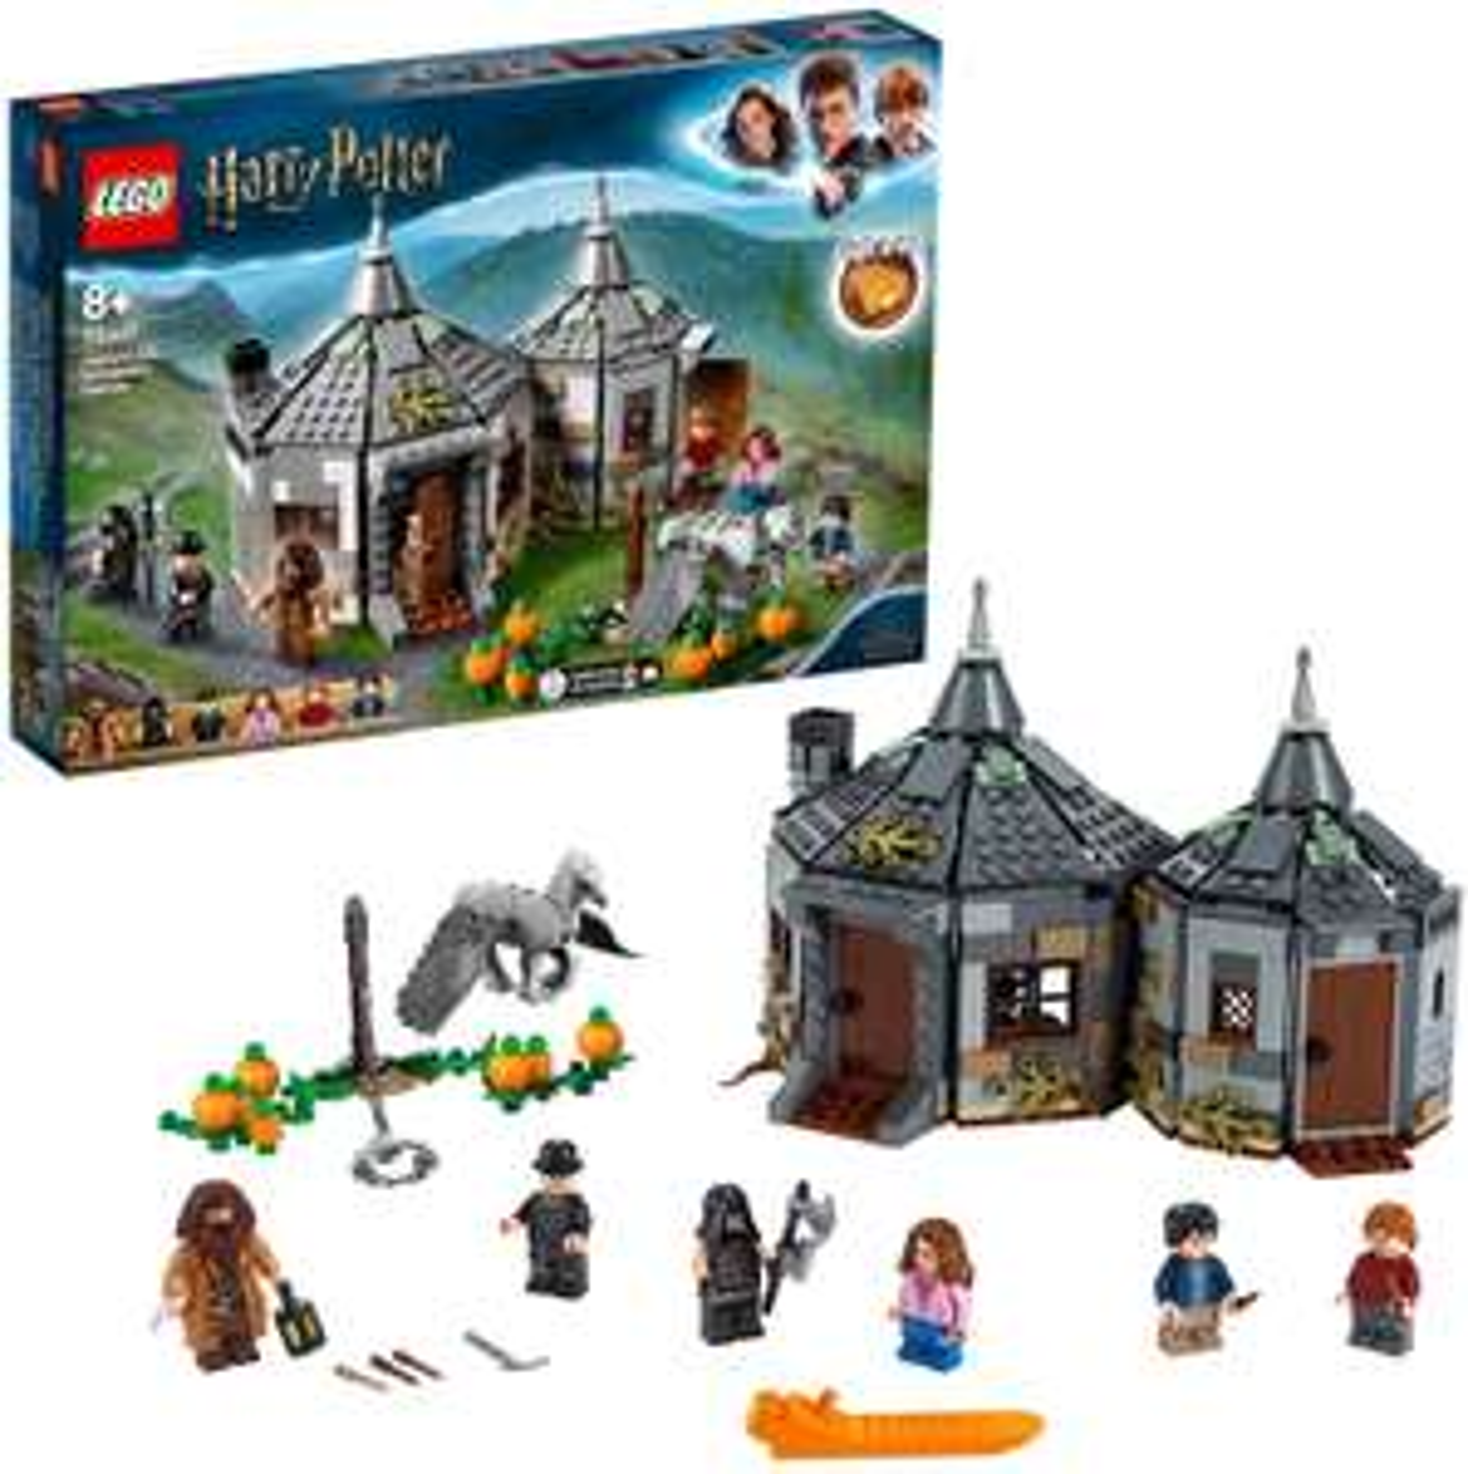 LEGO Harry Potter 75947 Hagrid's Hut: Buckbeak's Rescue (Wembley) - £33 Tesco in store